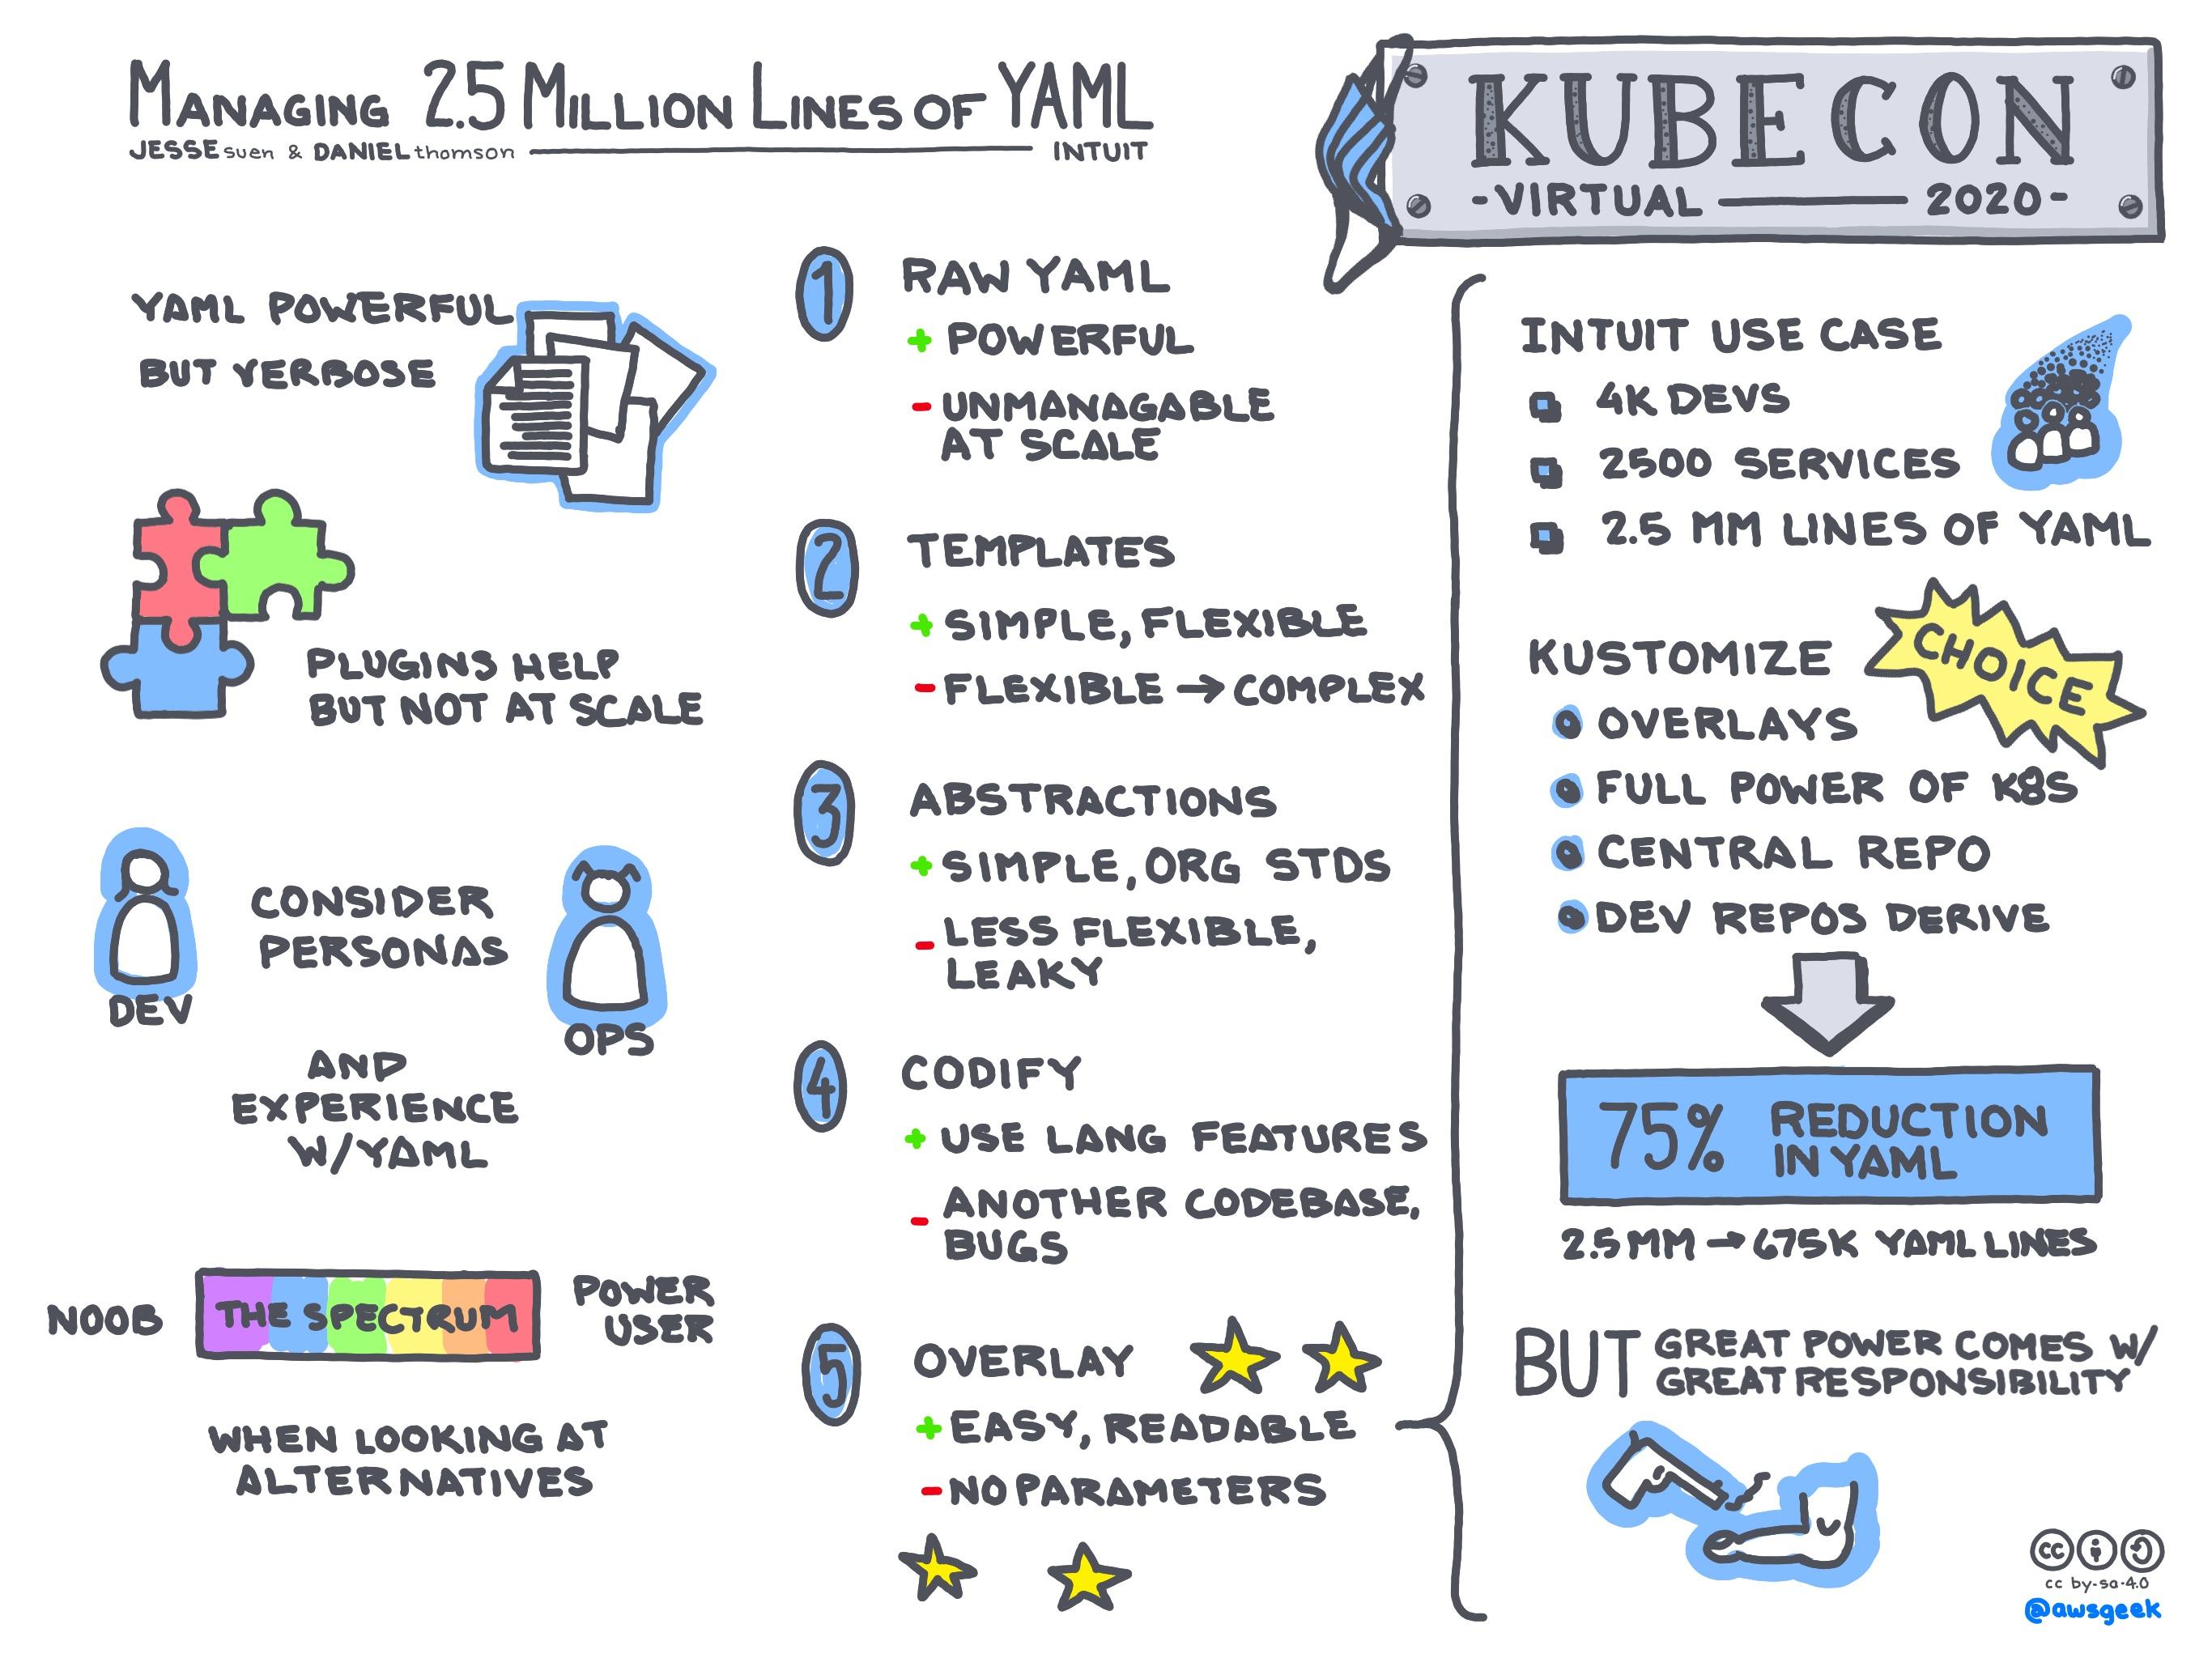 Managing-2-5-Million-Lines-of-YAML.jpg